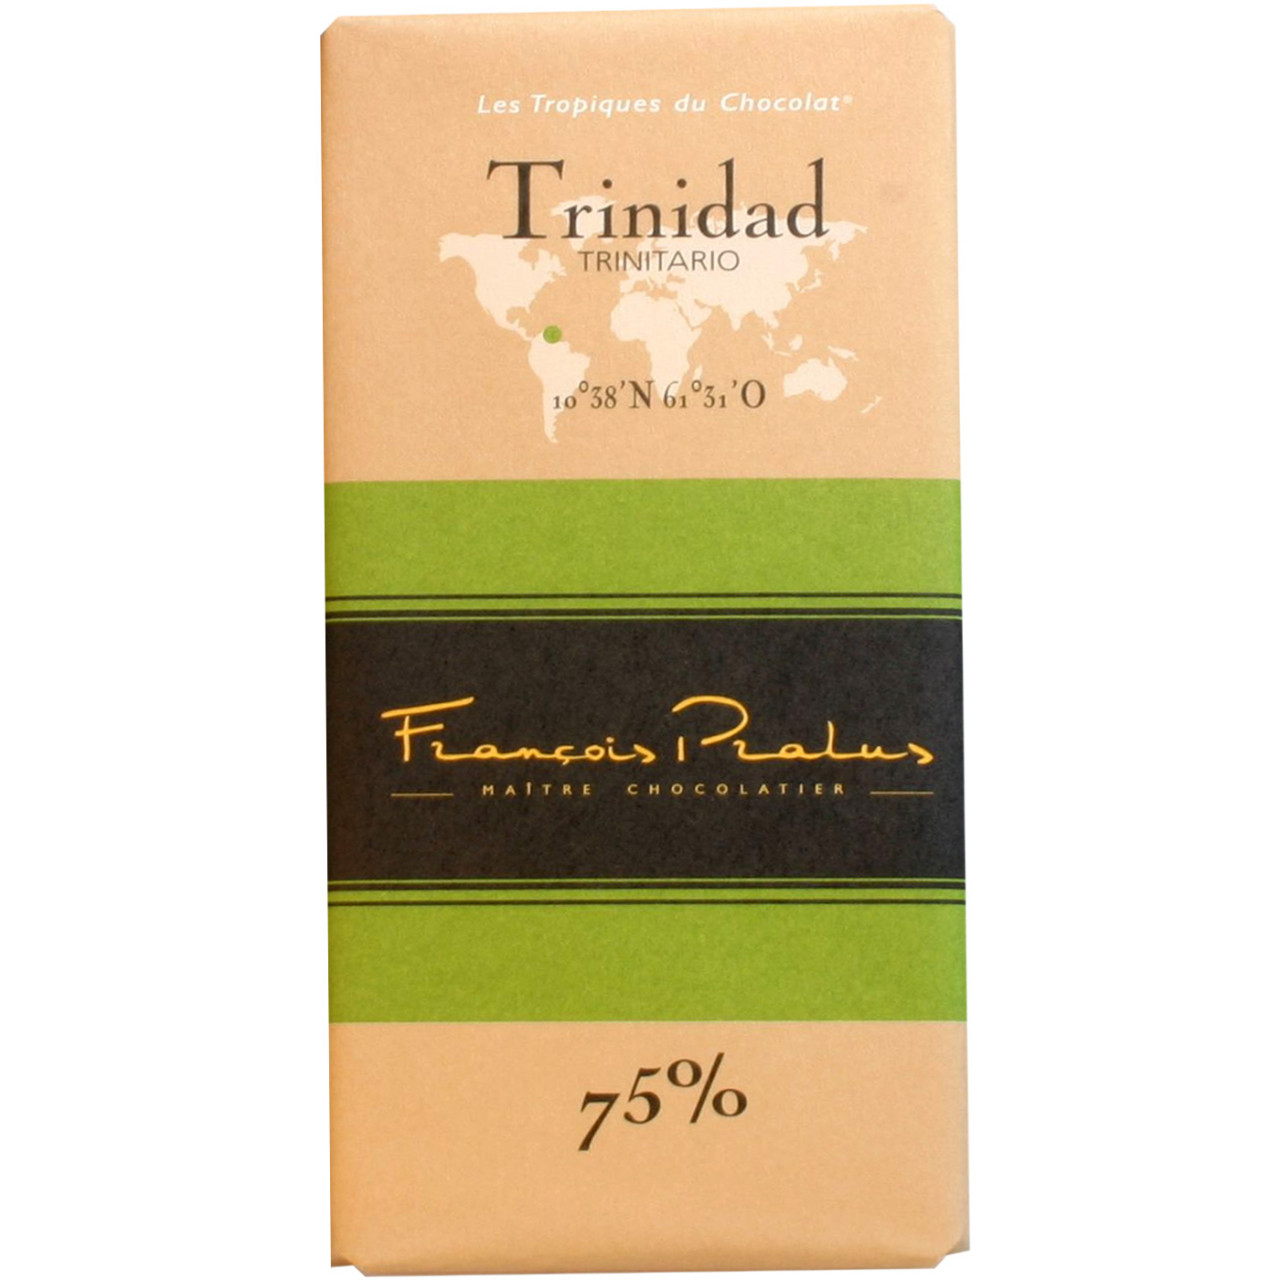 Dunkle Schokolade, 75%, Trinidad, Trinitario, dark chocolate, chocolat noir, Herkunftsschokolade, Bean to bar,